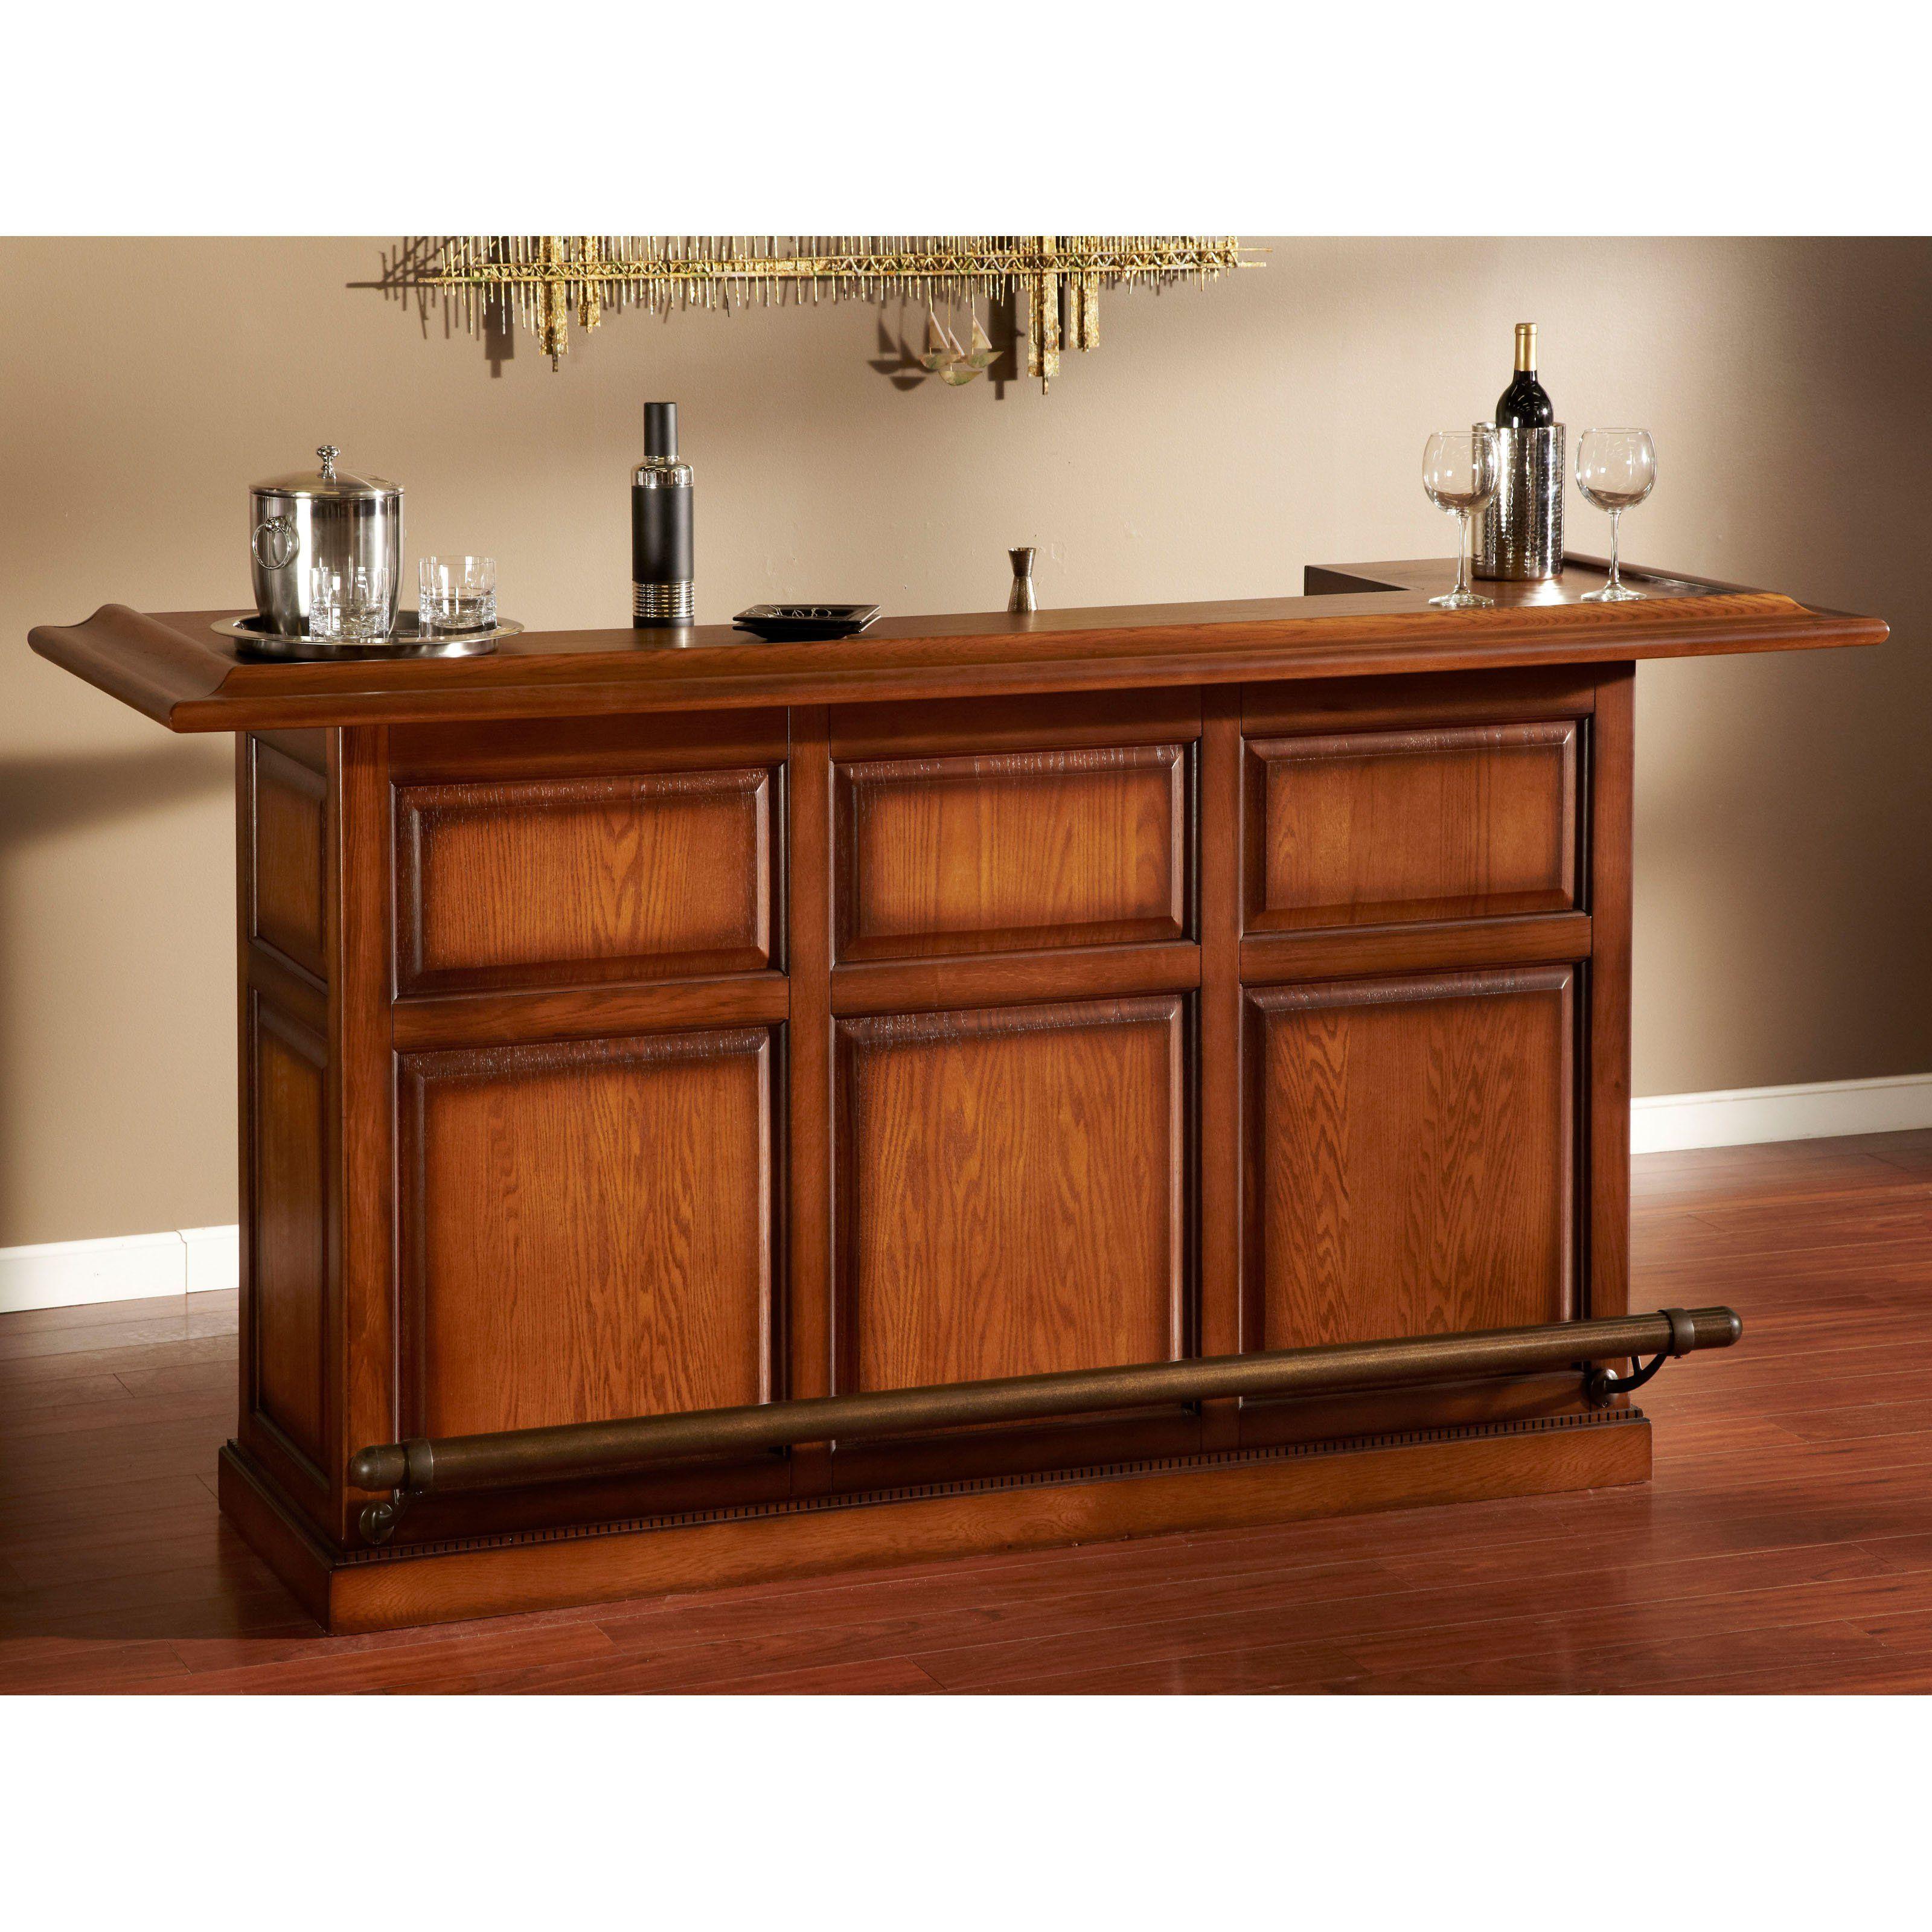 American Heritage Furniture Restoration: AHB Kokomo Home Bar - Vintage Oak